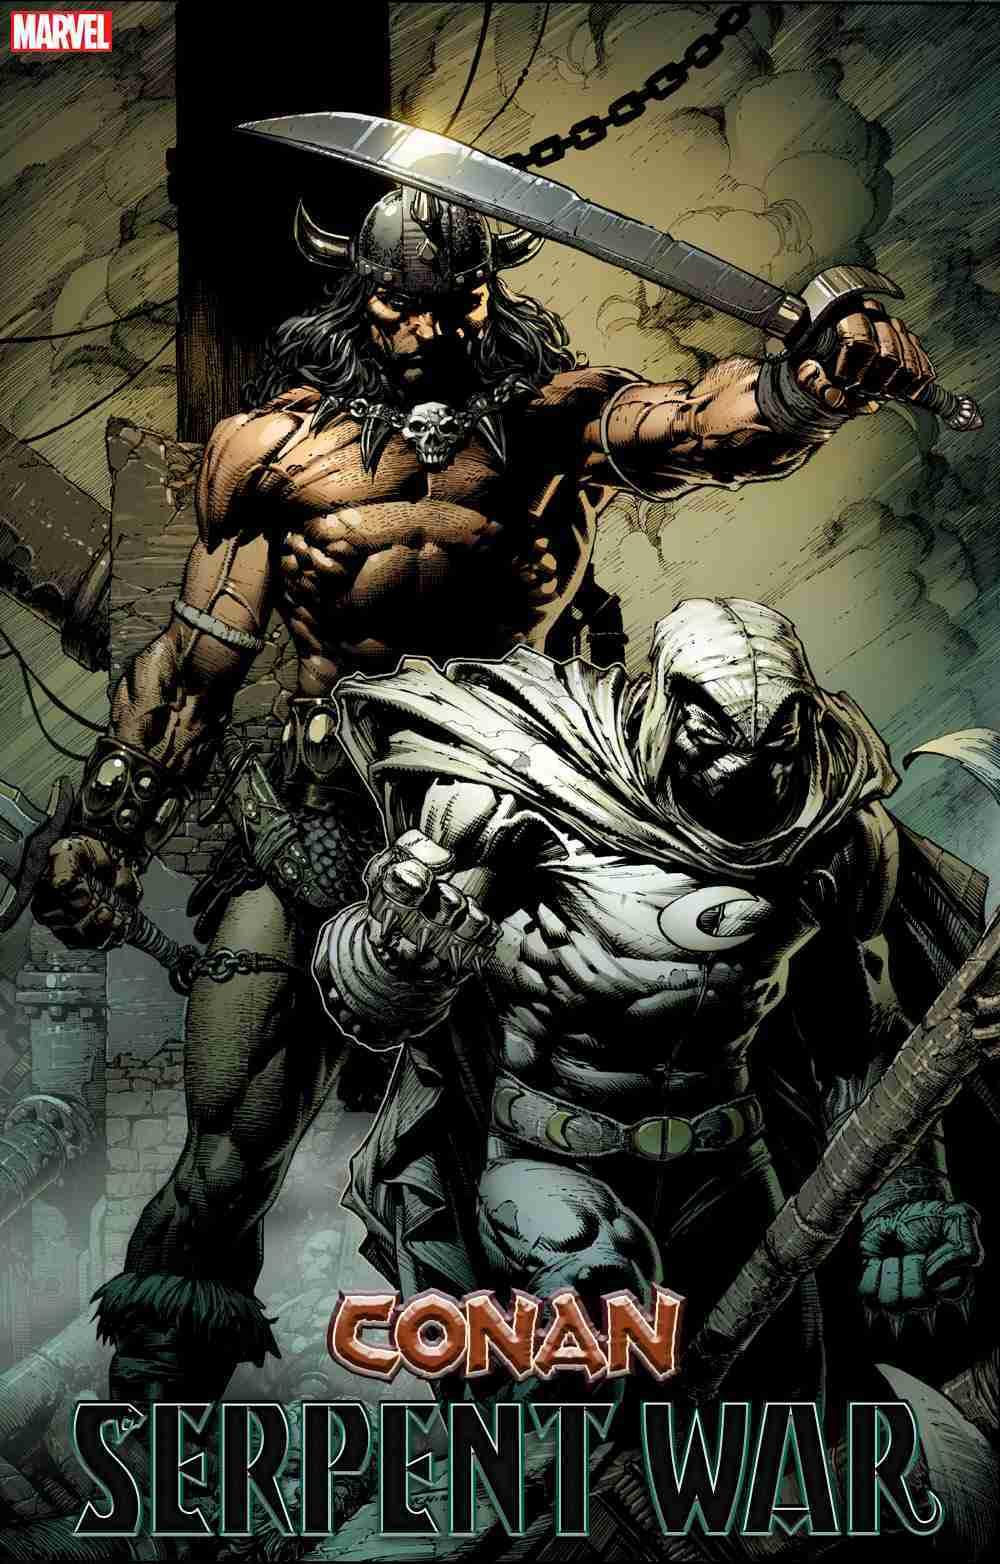 Conan Serpent War David Finch Variant